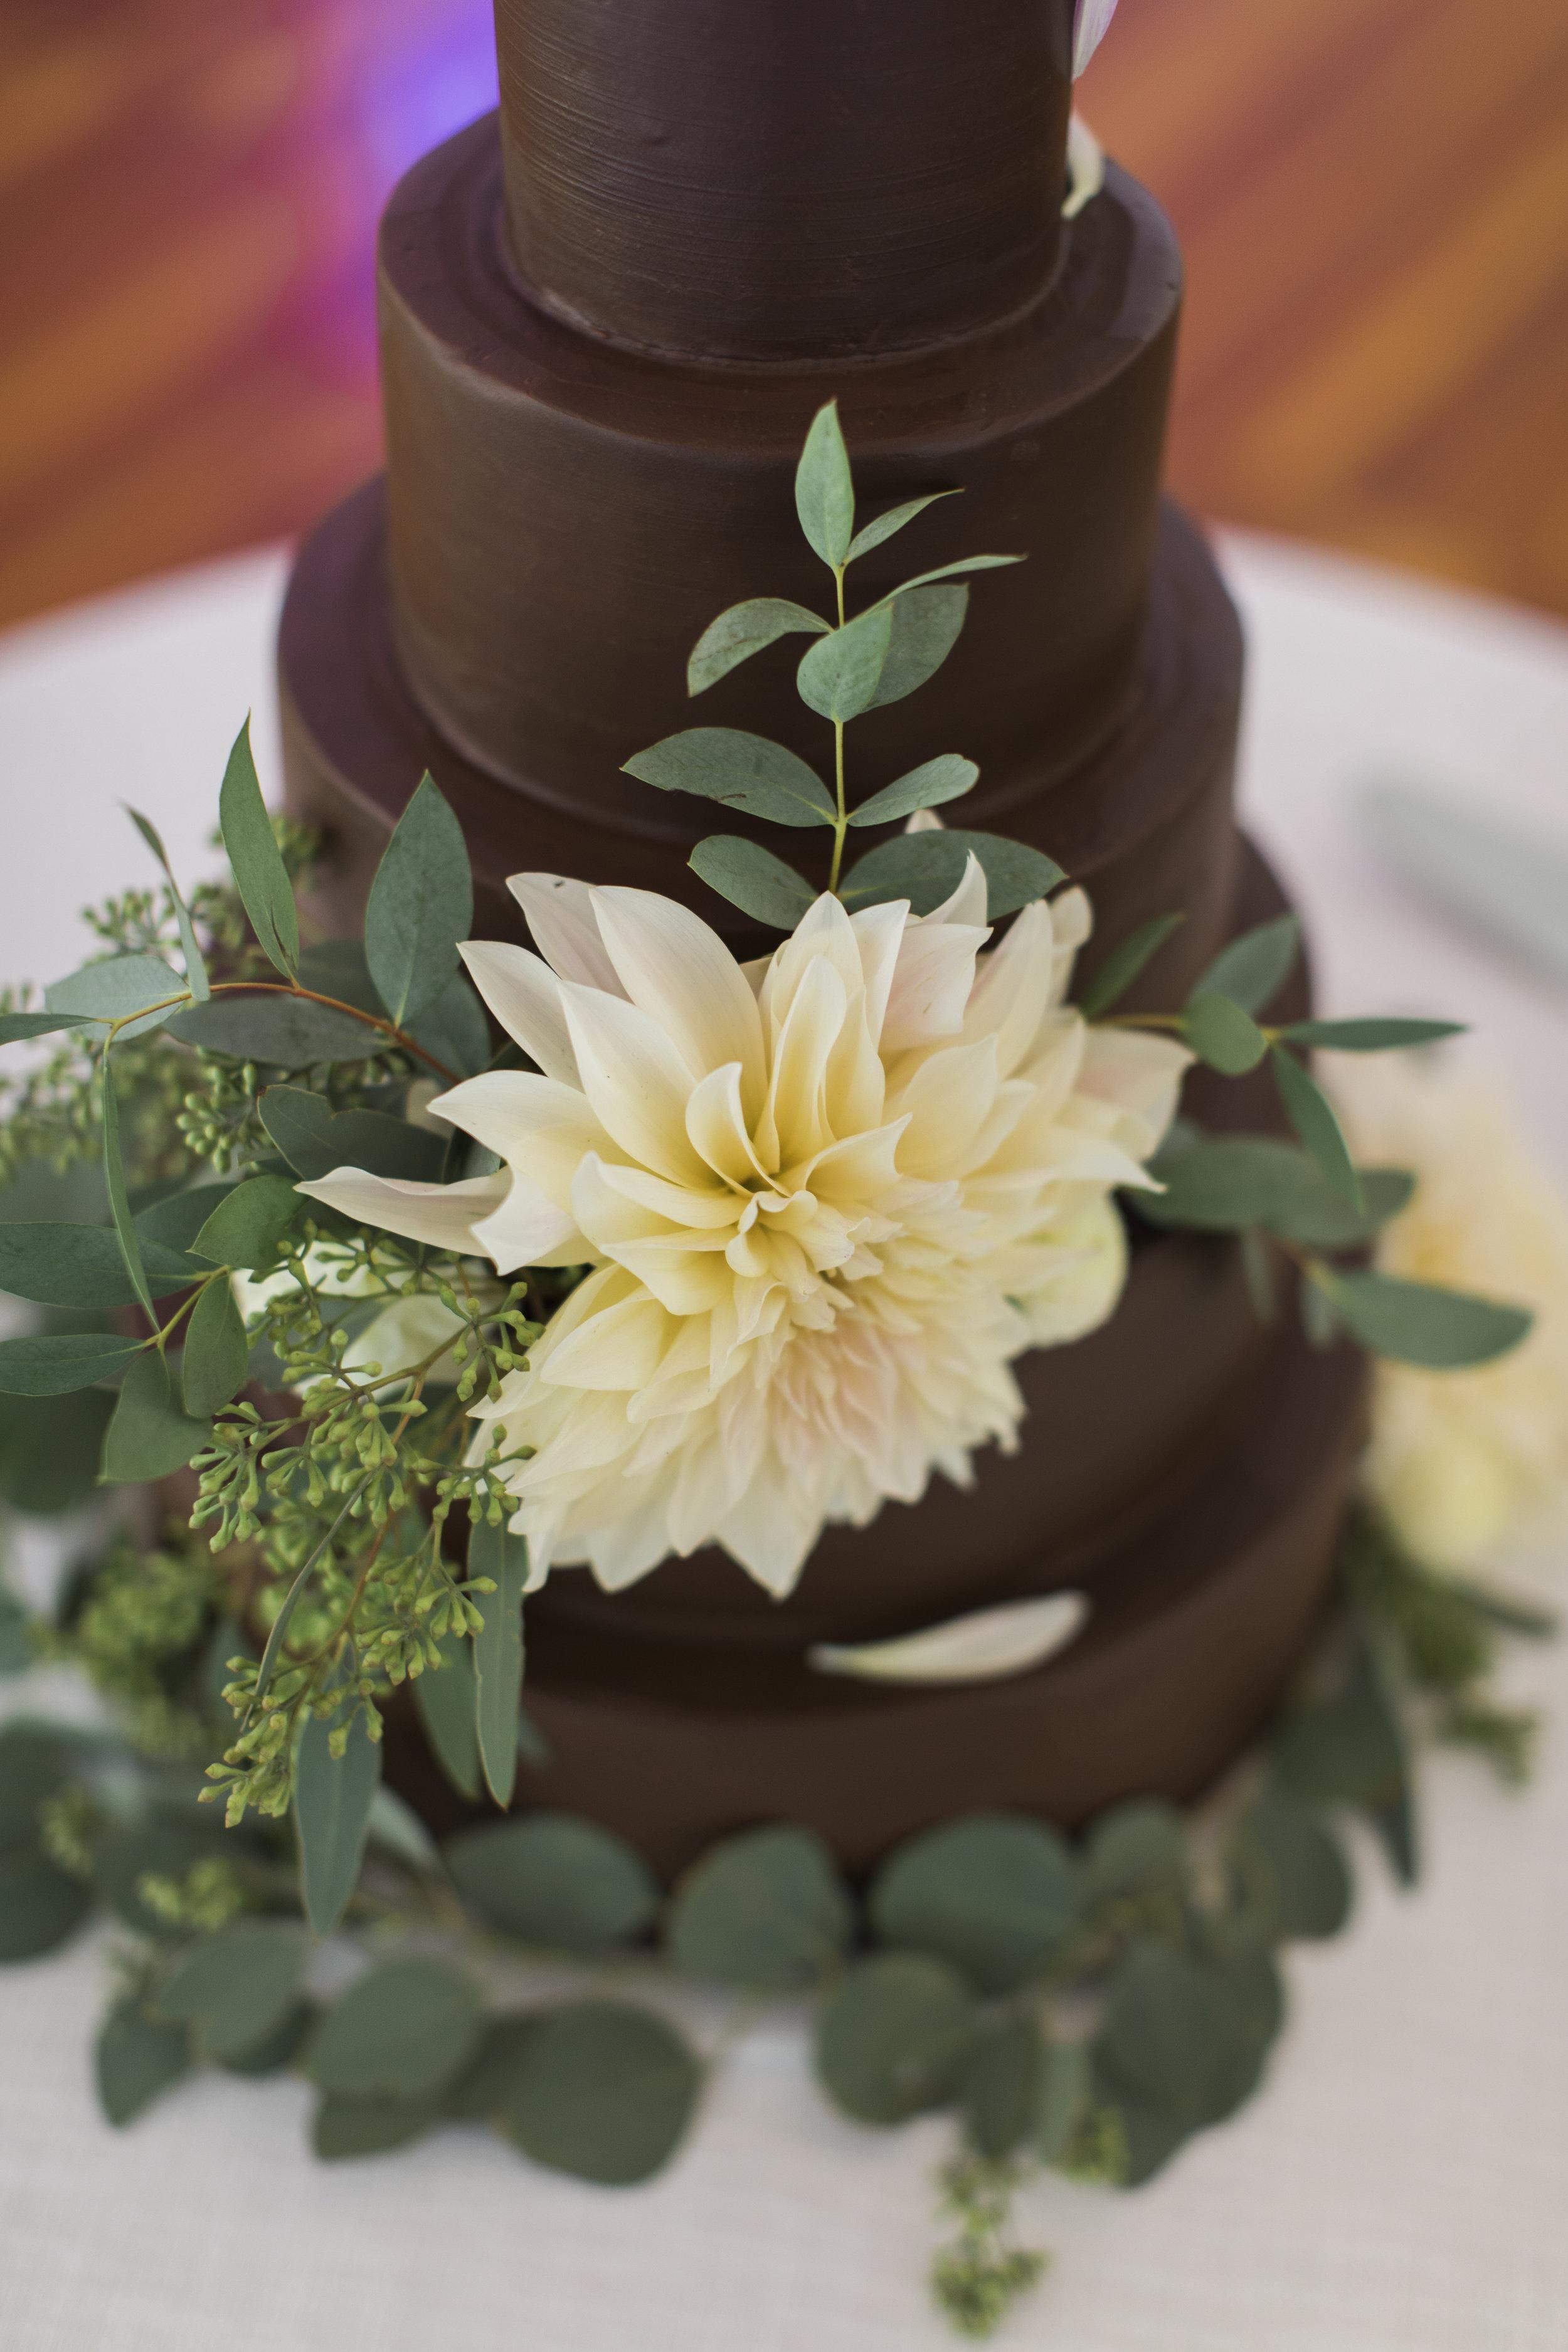 Chocolate Dahlia, The Farmer's Daughter